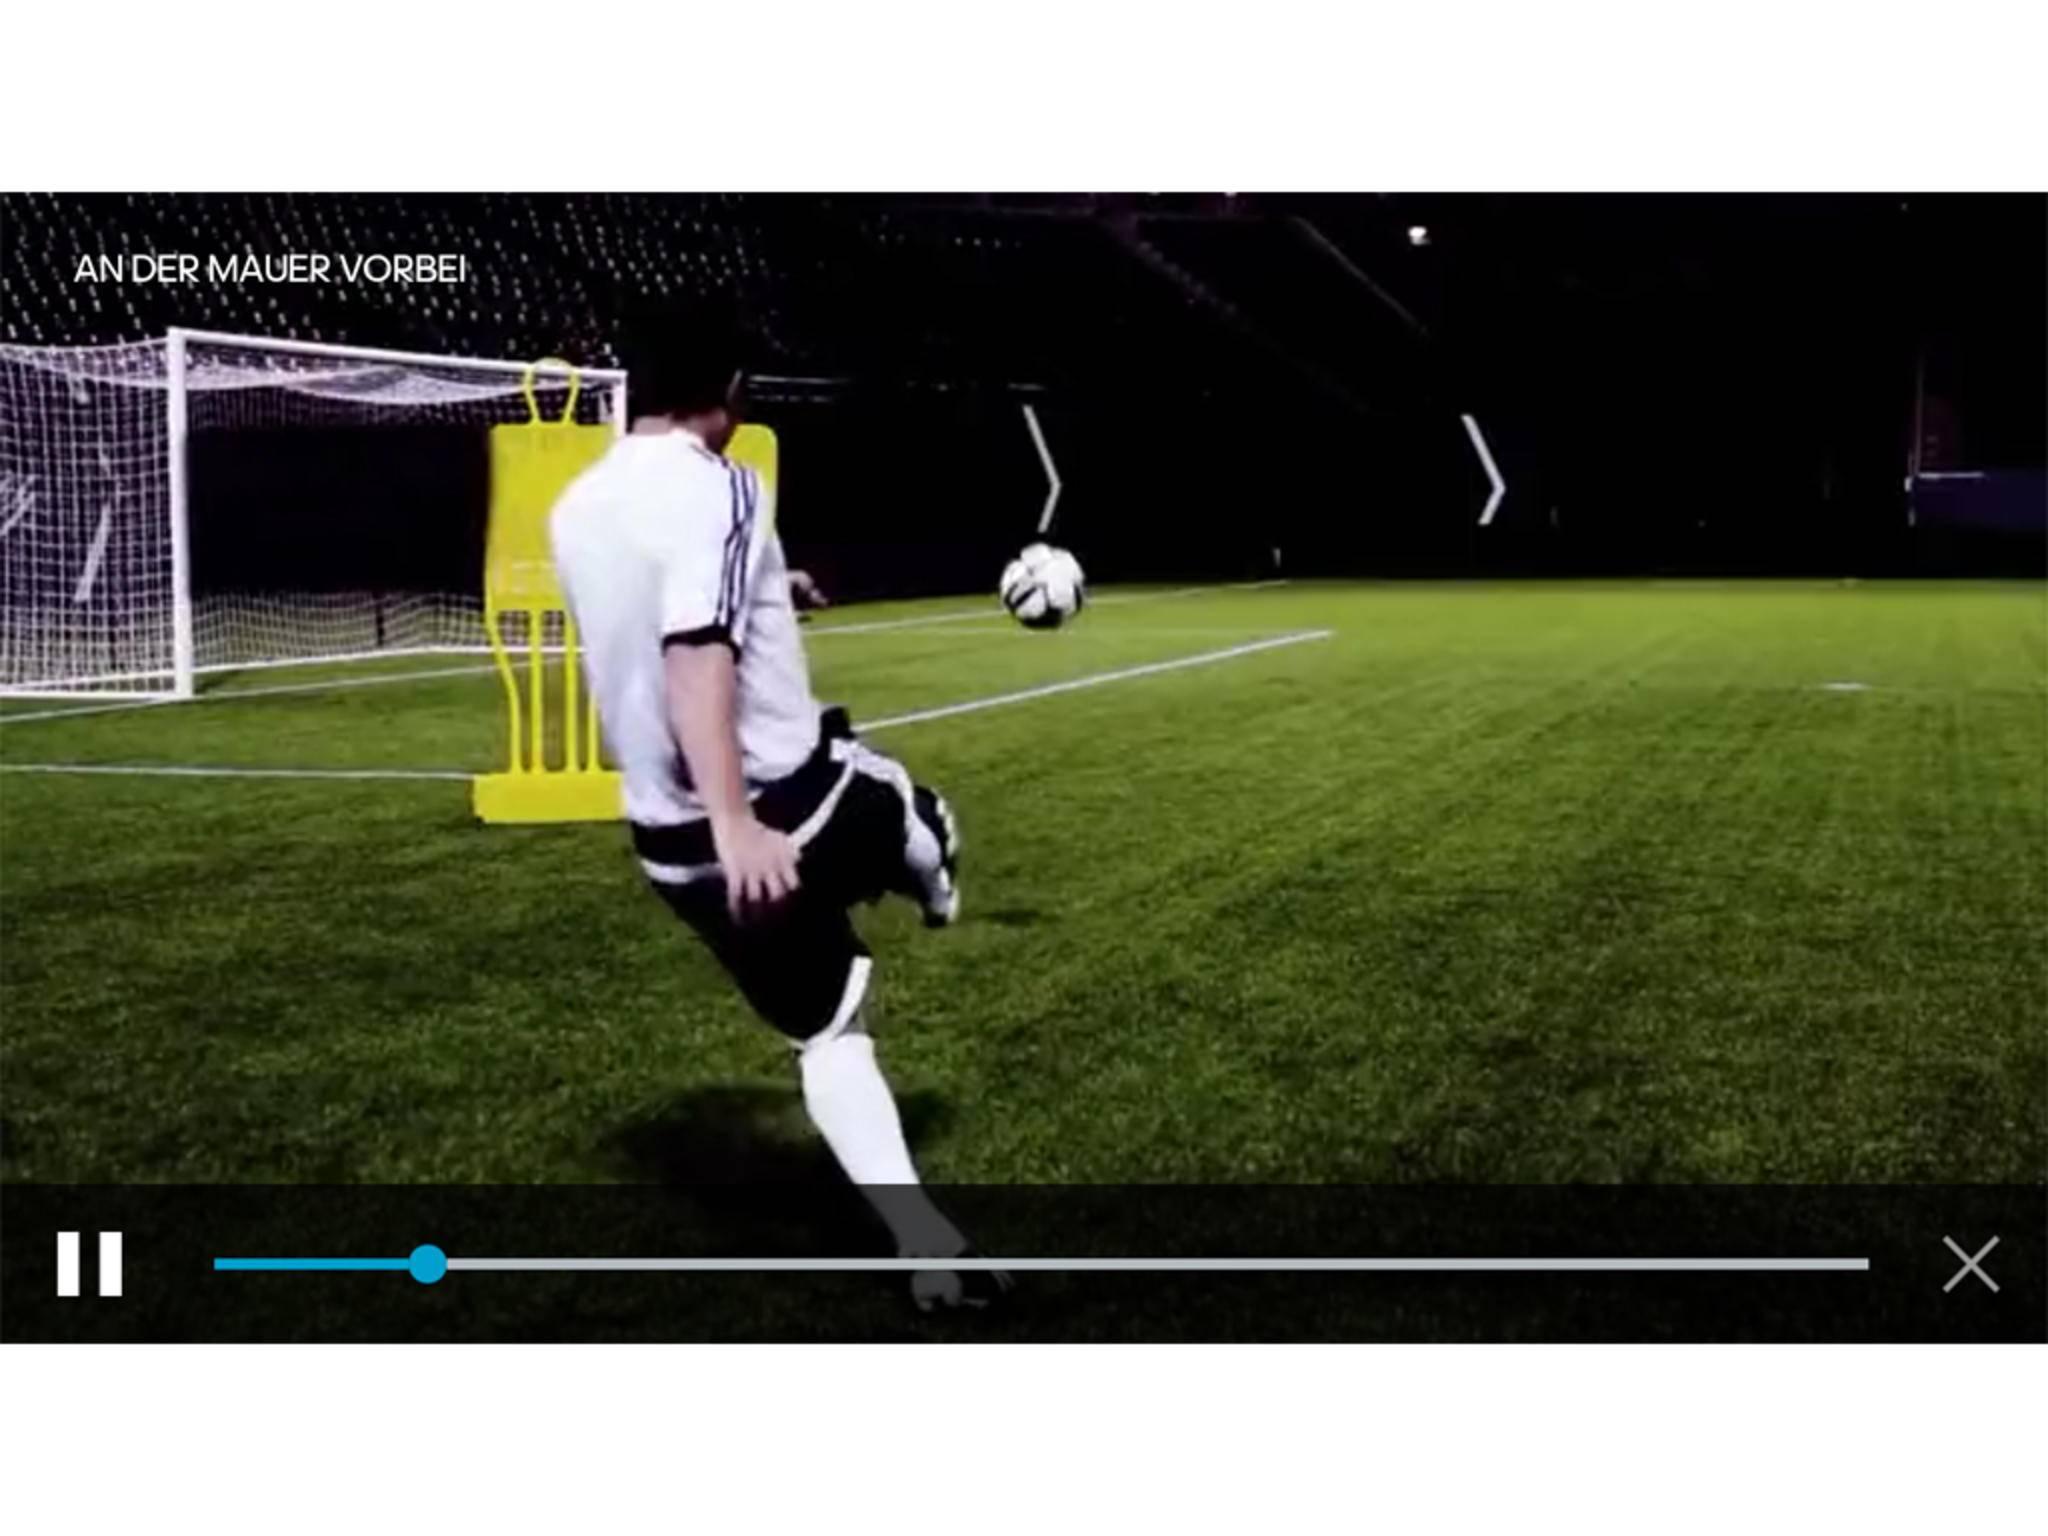 Adidas miCoach Smart Ball App 11